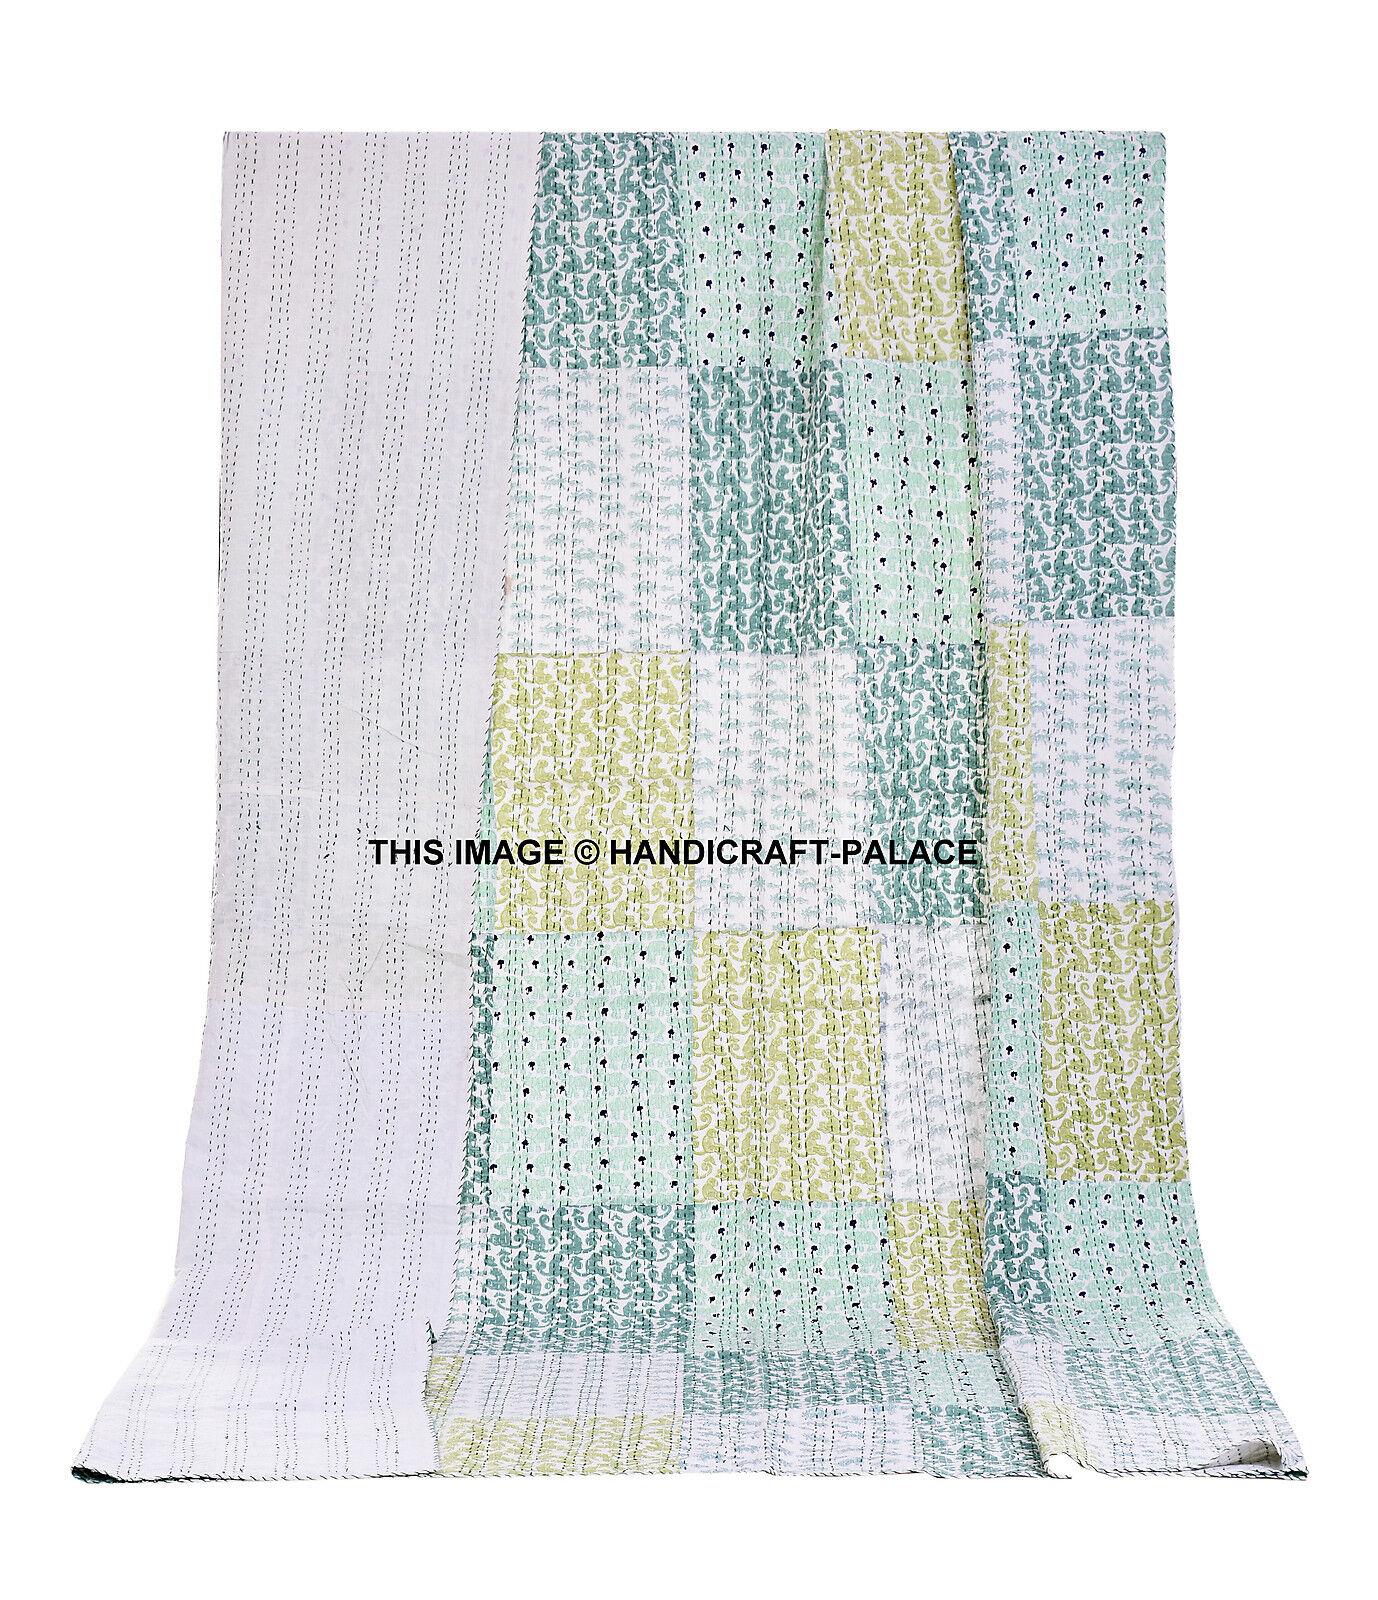 Indian Kantha Queen Quilt Handmade Patchwork Reversible Bedspread Blanket Throw